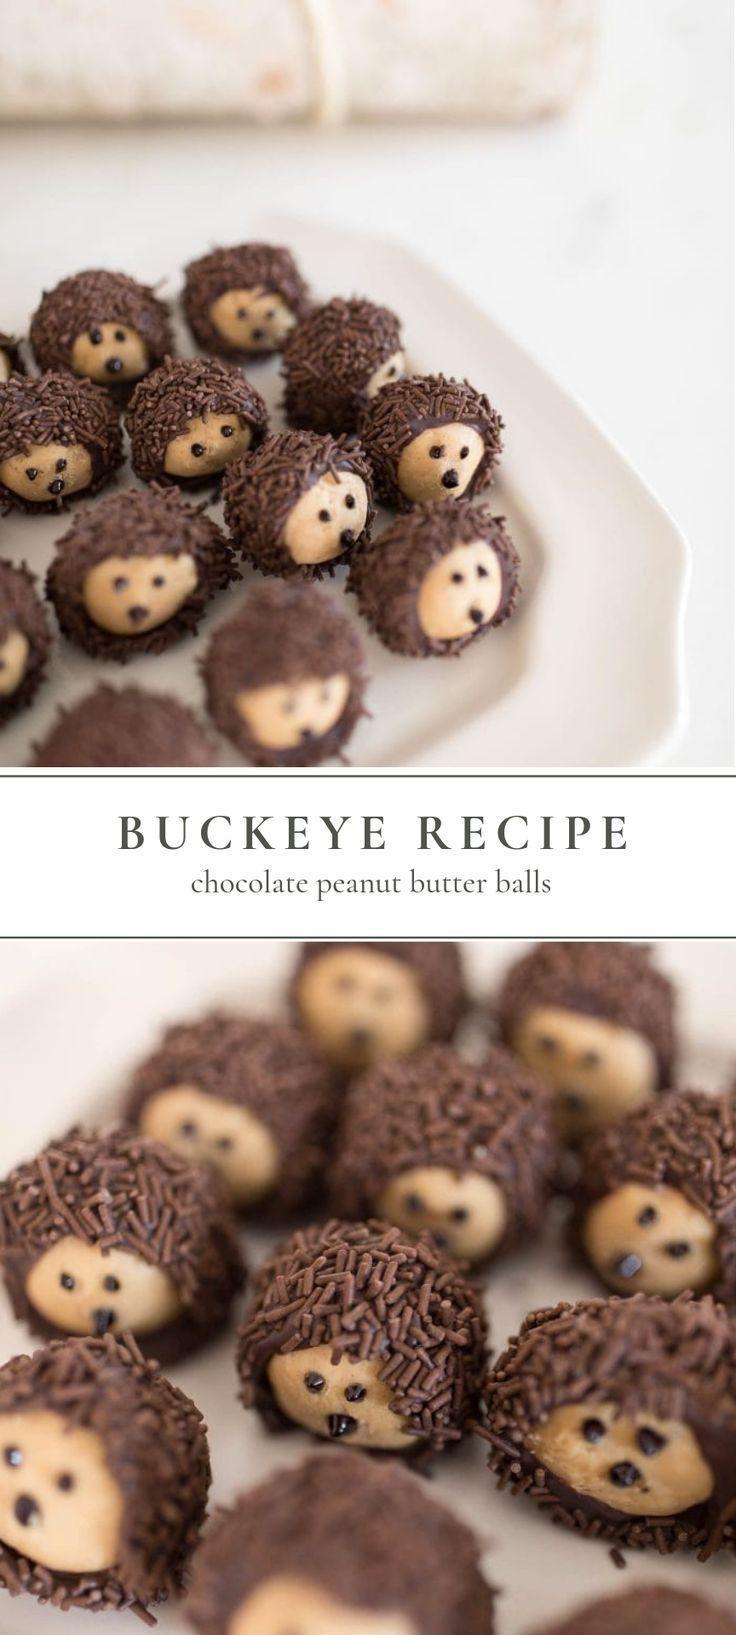 Buckeye Recipe | Chocolate Peanut Butter Balls #peanutbutterballs